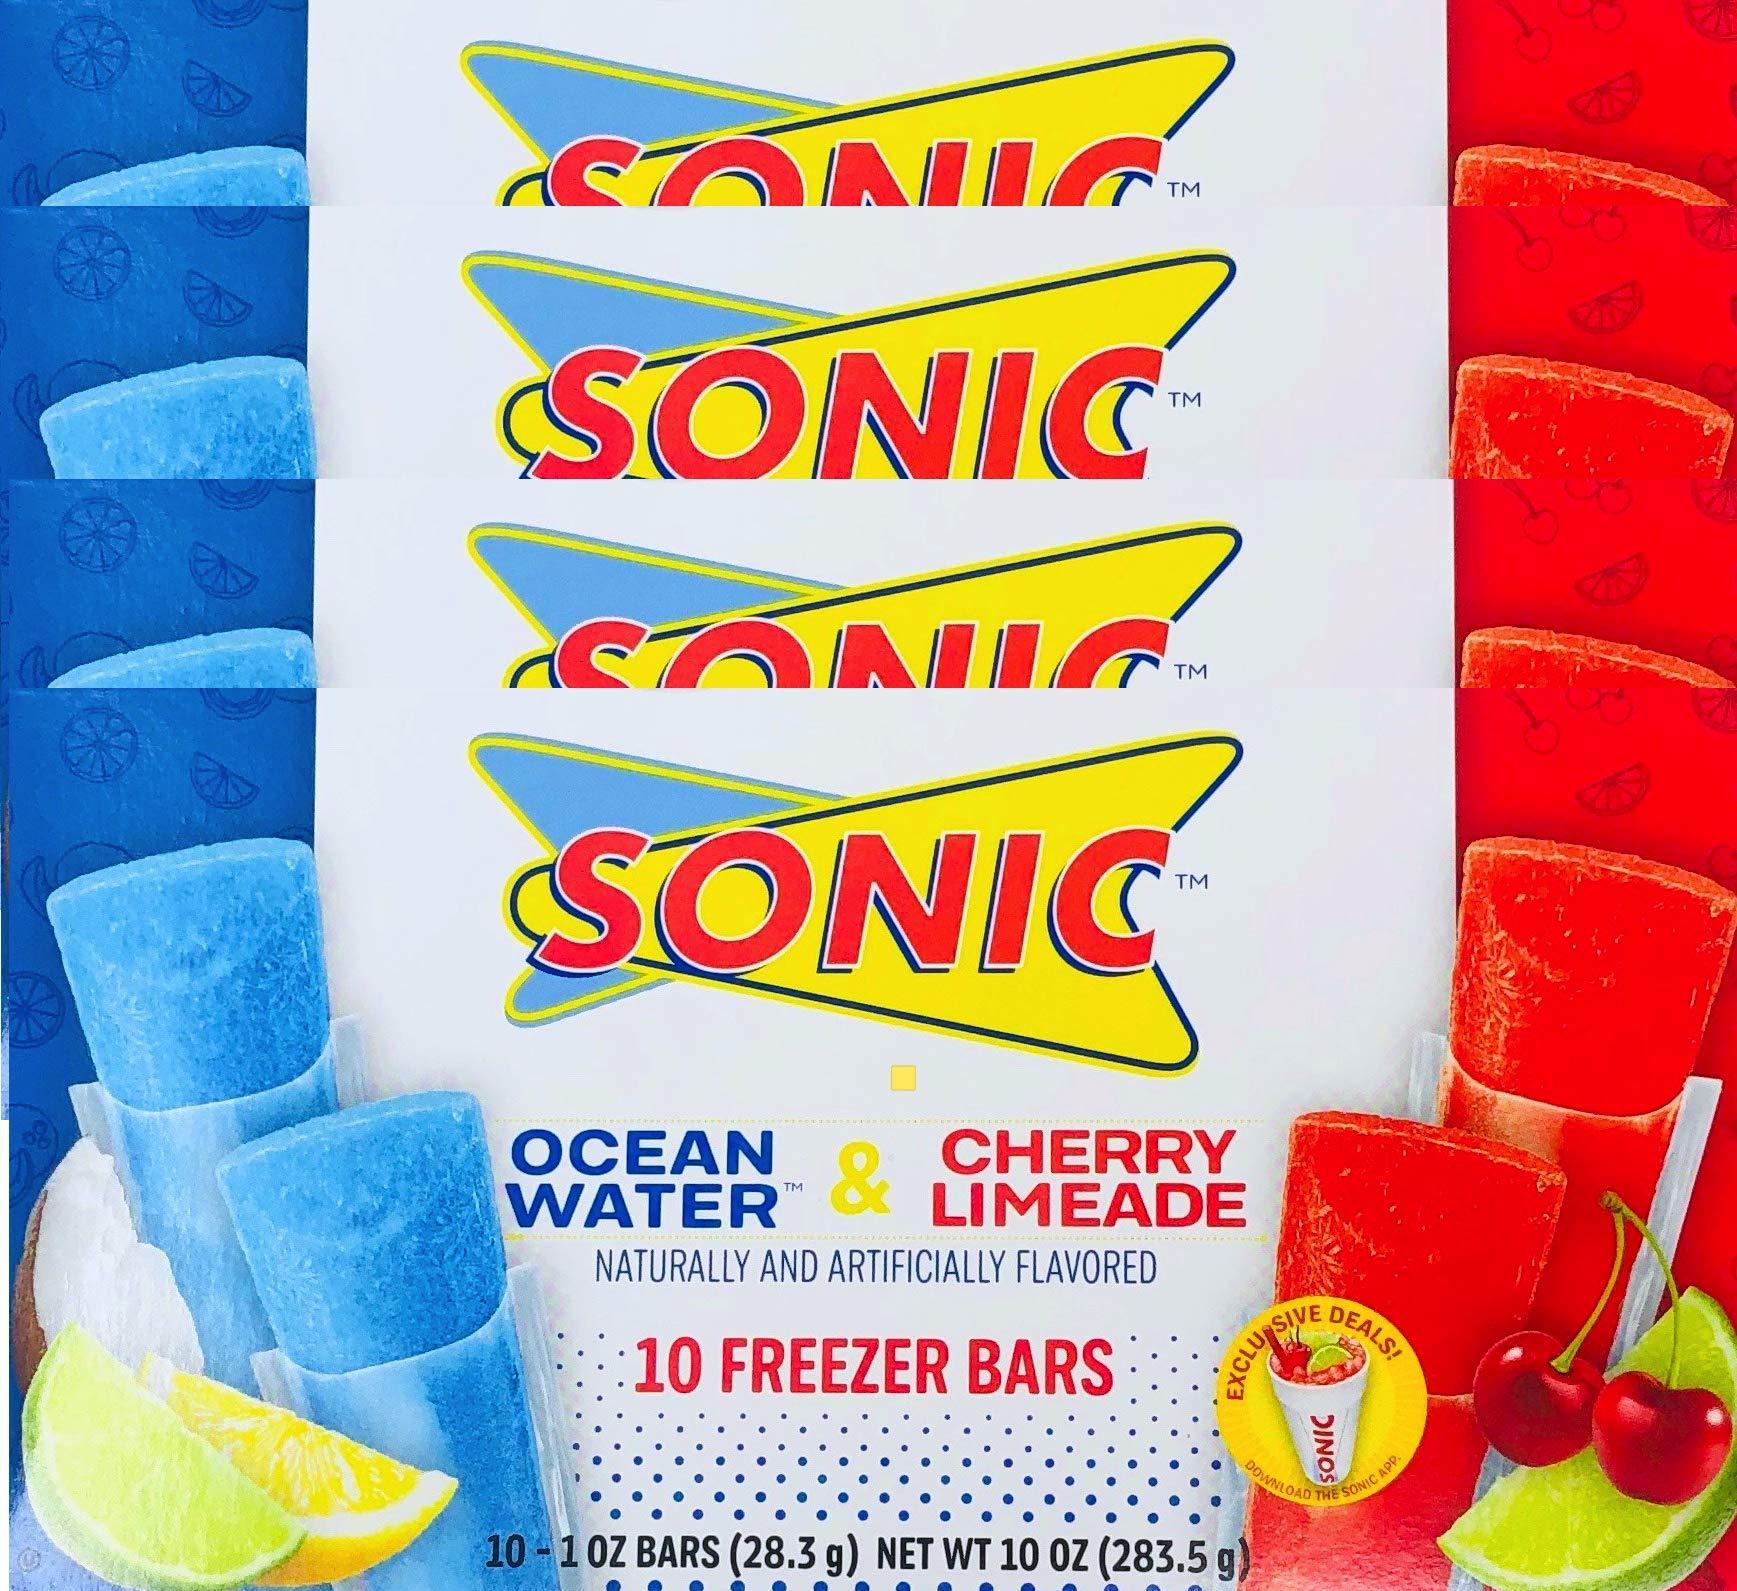 NEW Sonic Freezer Bars Ocean Water & Cherry Limeade 10- 1 oz Bars (4)